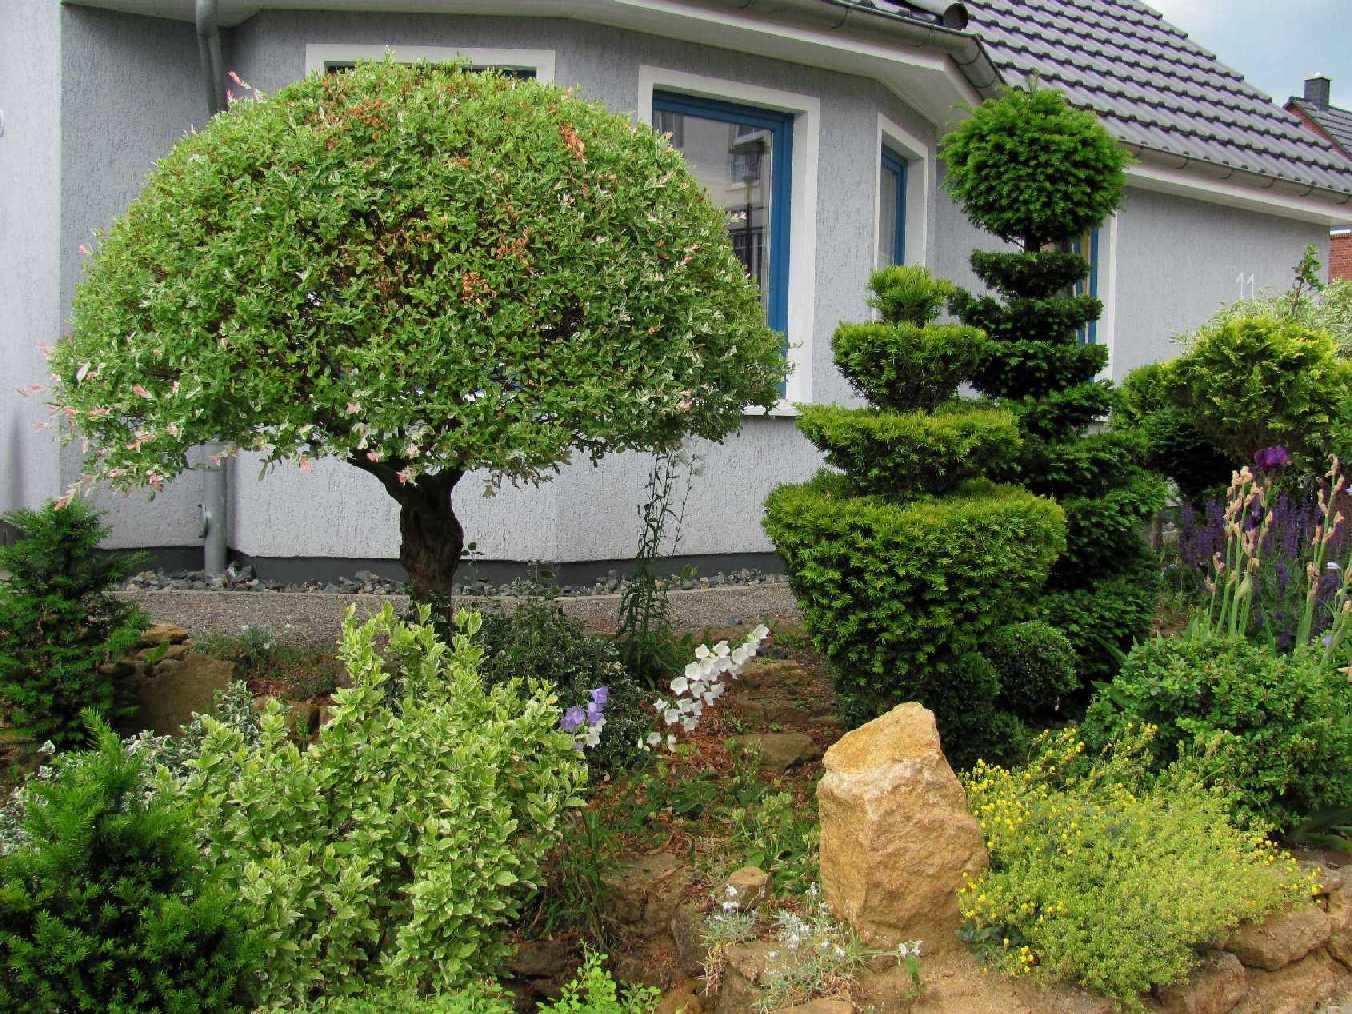 zypresse pflege wann kann man koniferen pflanzen hecke. Black Bedroom Furniture Sets. Home Design Ideas